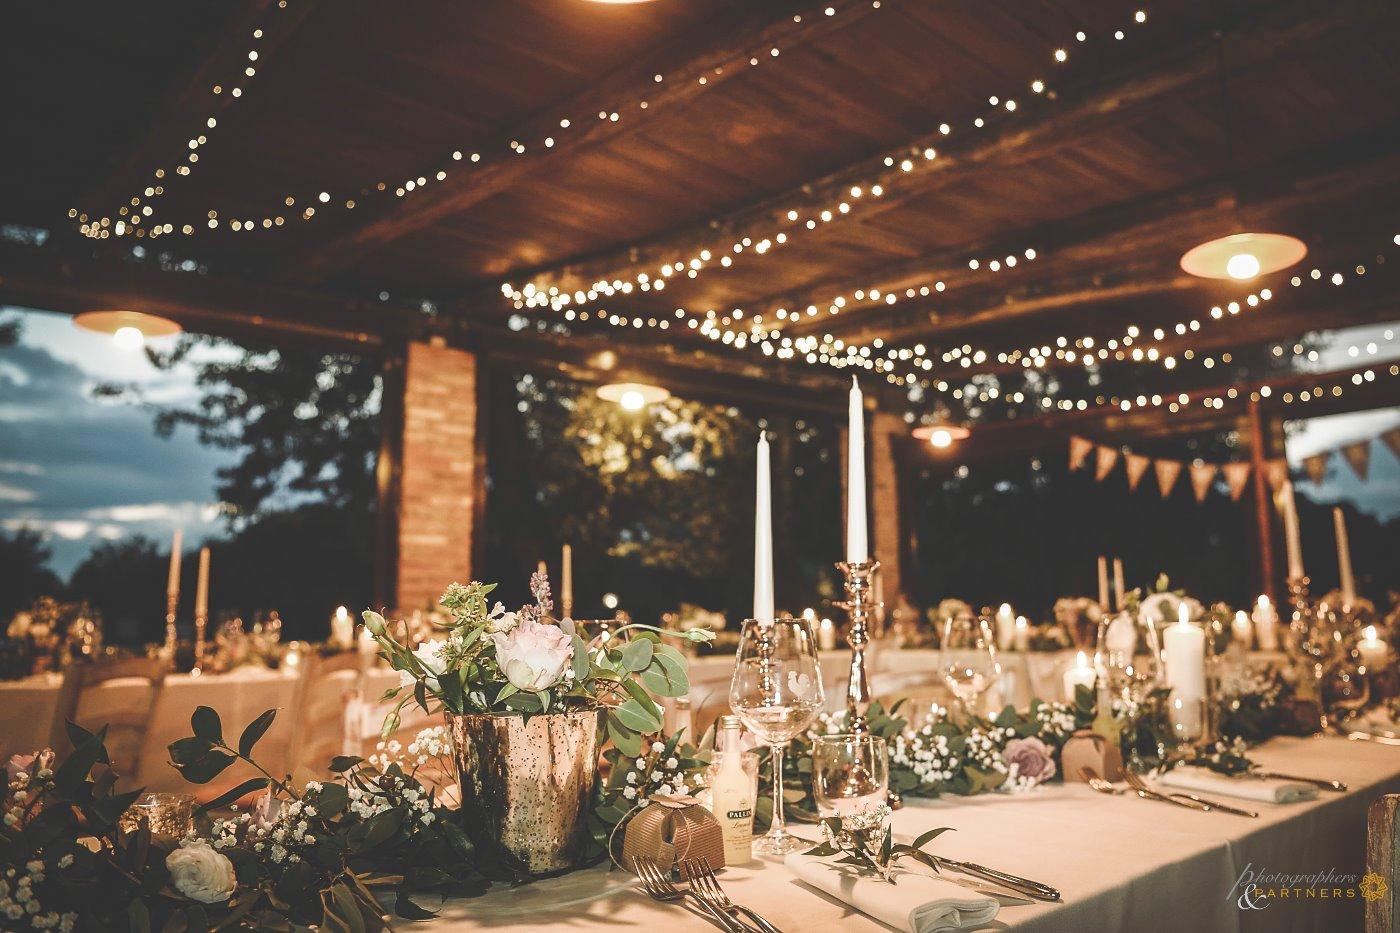 photography_weddings_siena_17.jpg